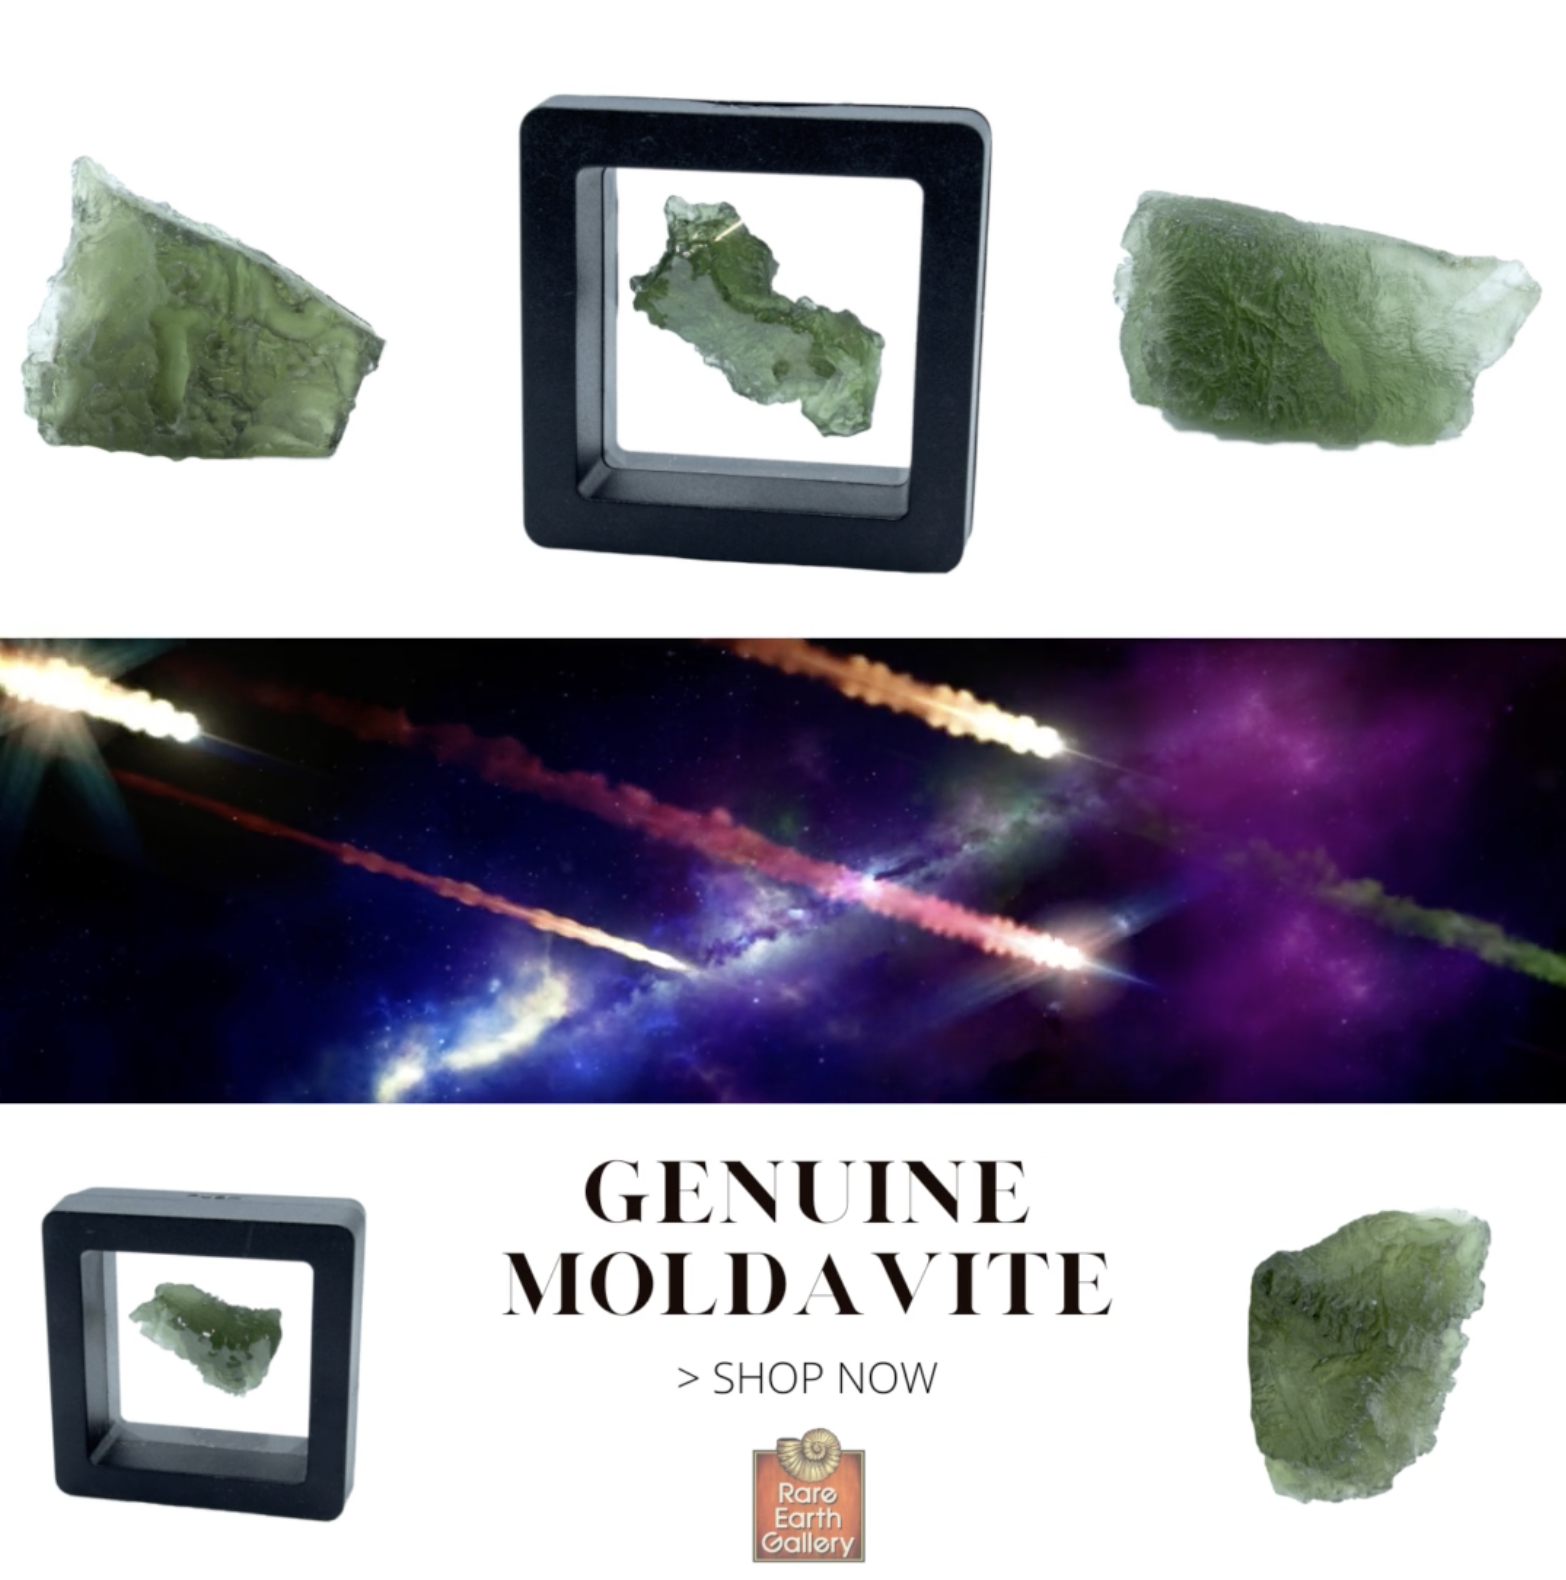 Moldavite Tektite Raw Nugget Rugged In Gel Case